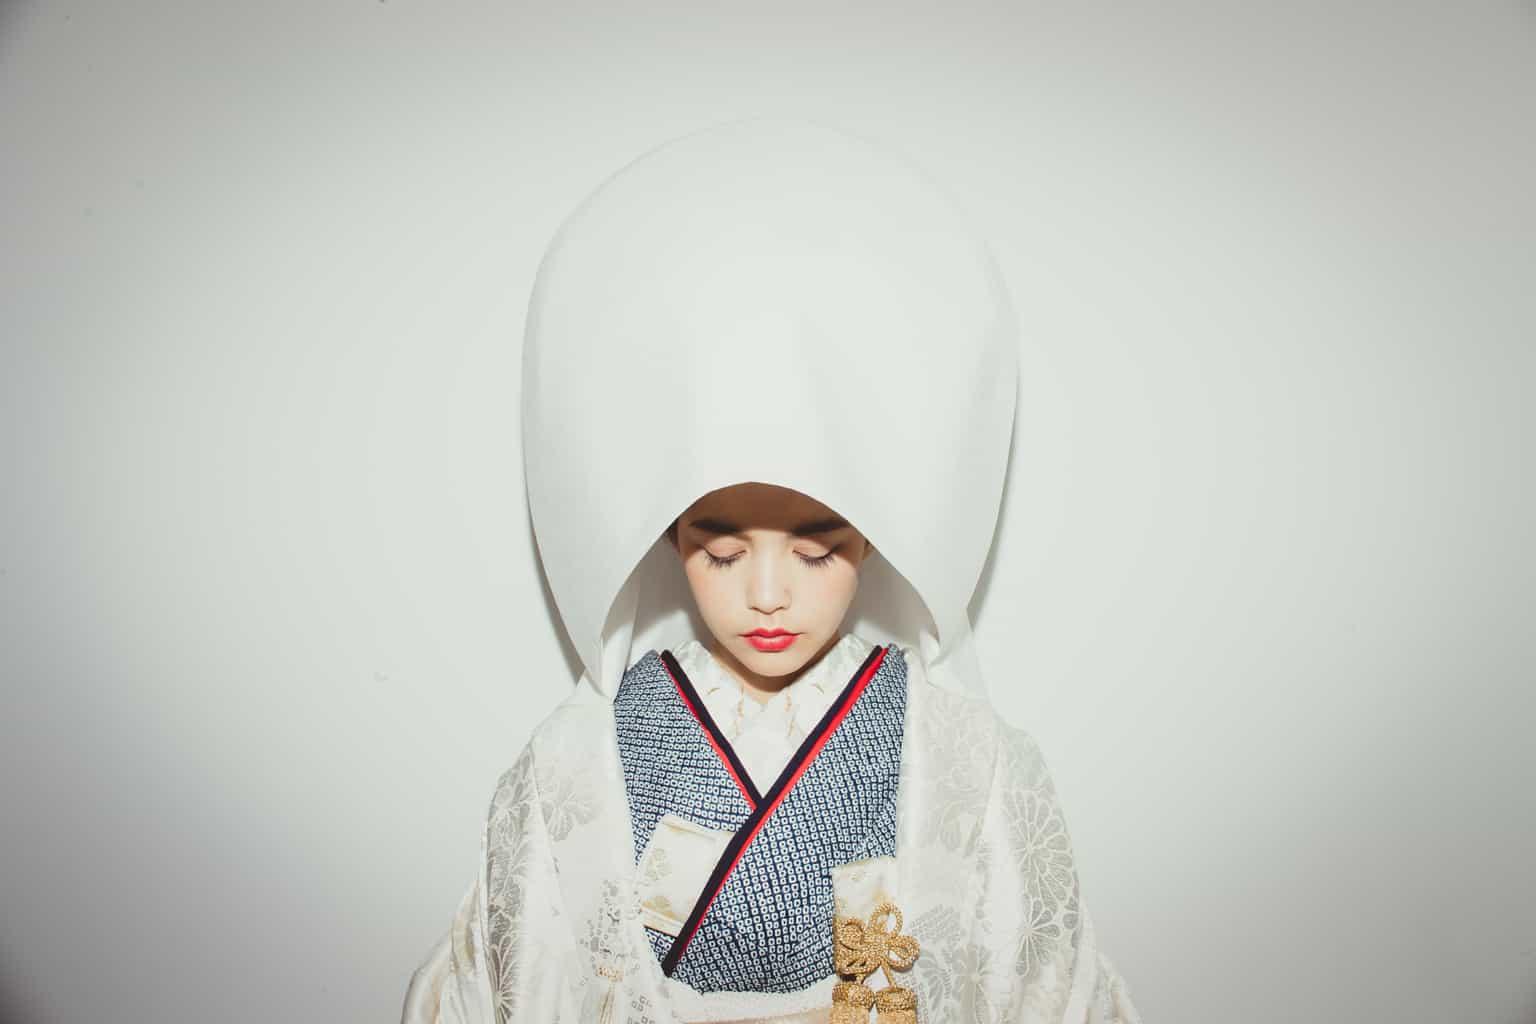 『CUCURU』のお洒落な花嫁着物で素敵な和装コーデを手に入れようのカバー写真